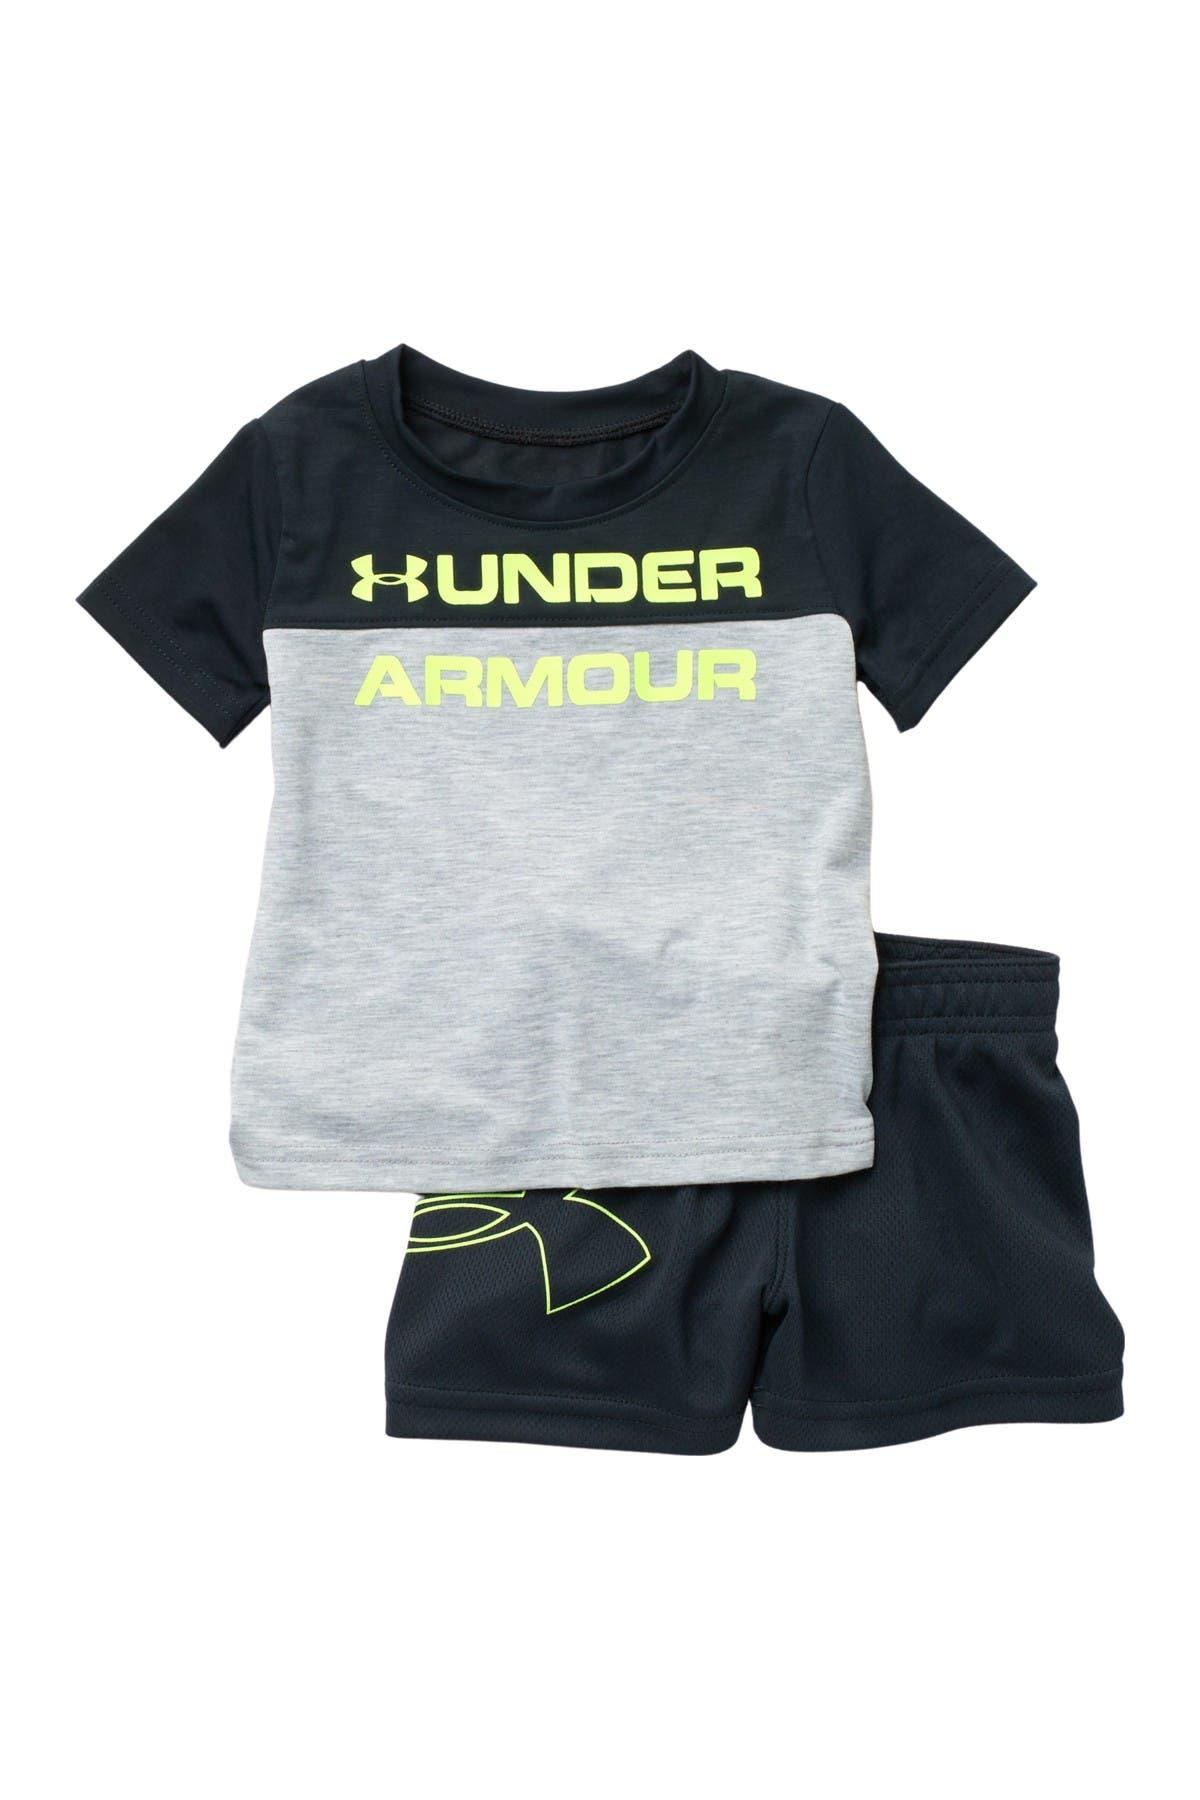 Under Armour Colorblock Tee & Mesh Shorts Set